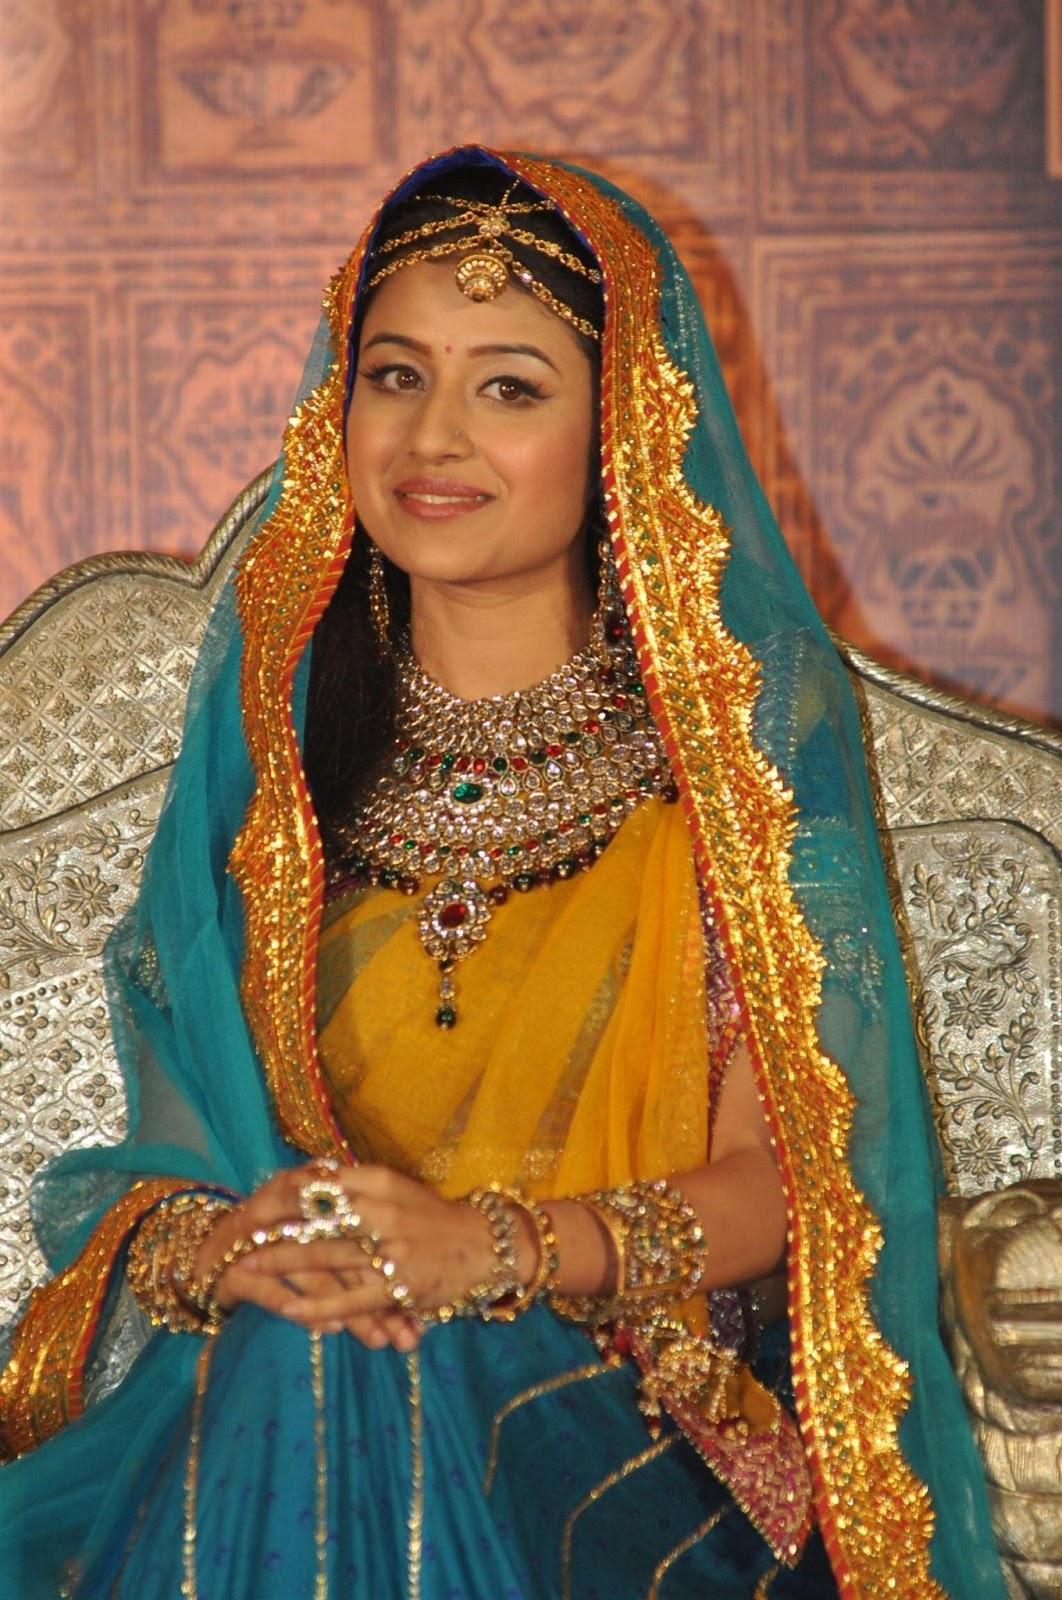 Ekta Kapoor Launches Jodha akbar in ZeeTV Tollywoodtv